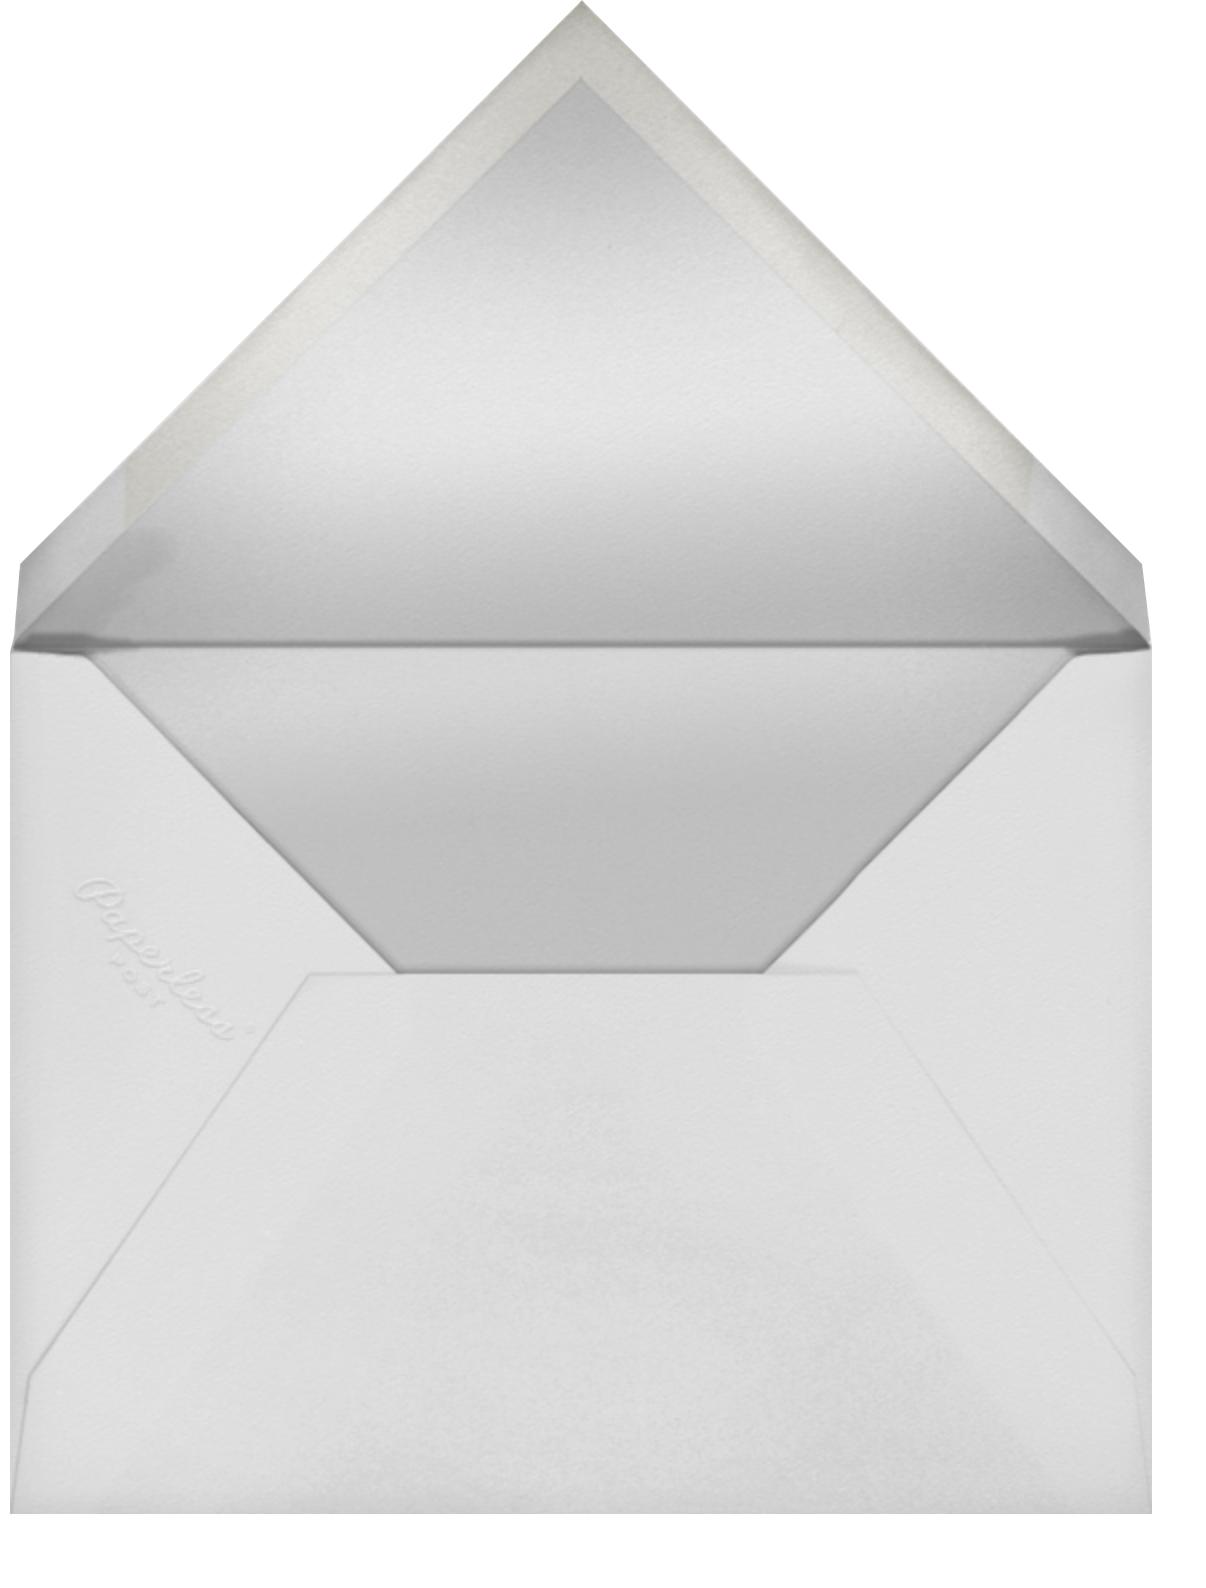 Drink / Drunk - Paperless Post - Housewarming - envelope back